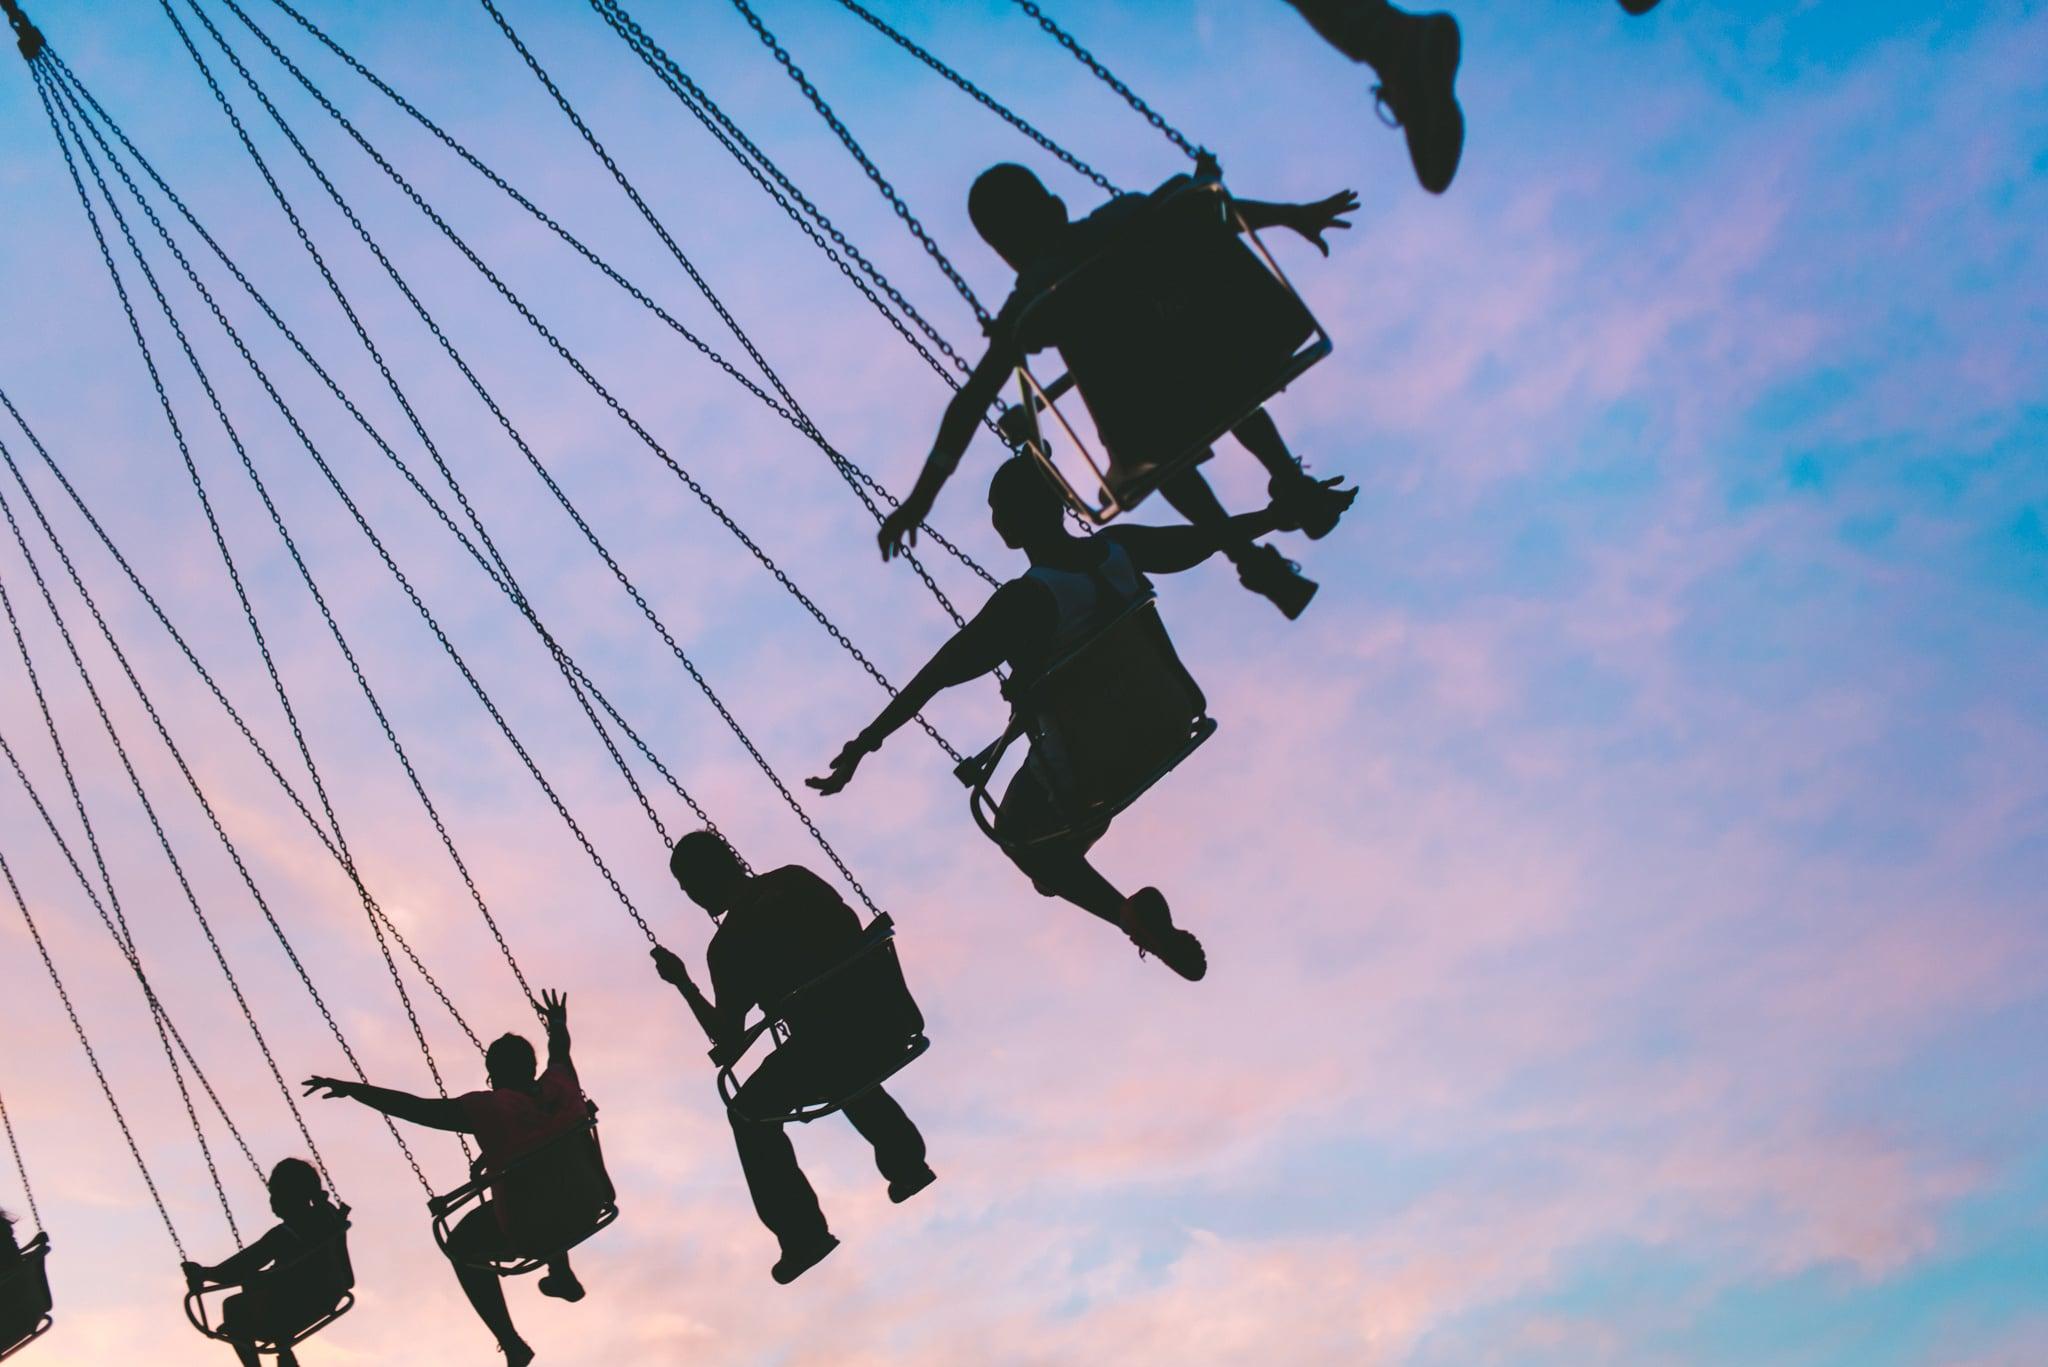 swinging silhouettes-1.JPG